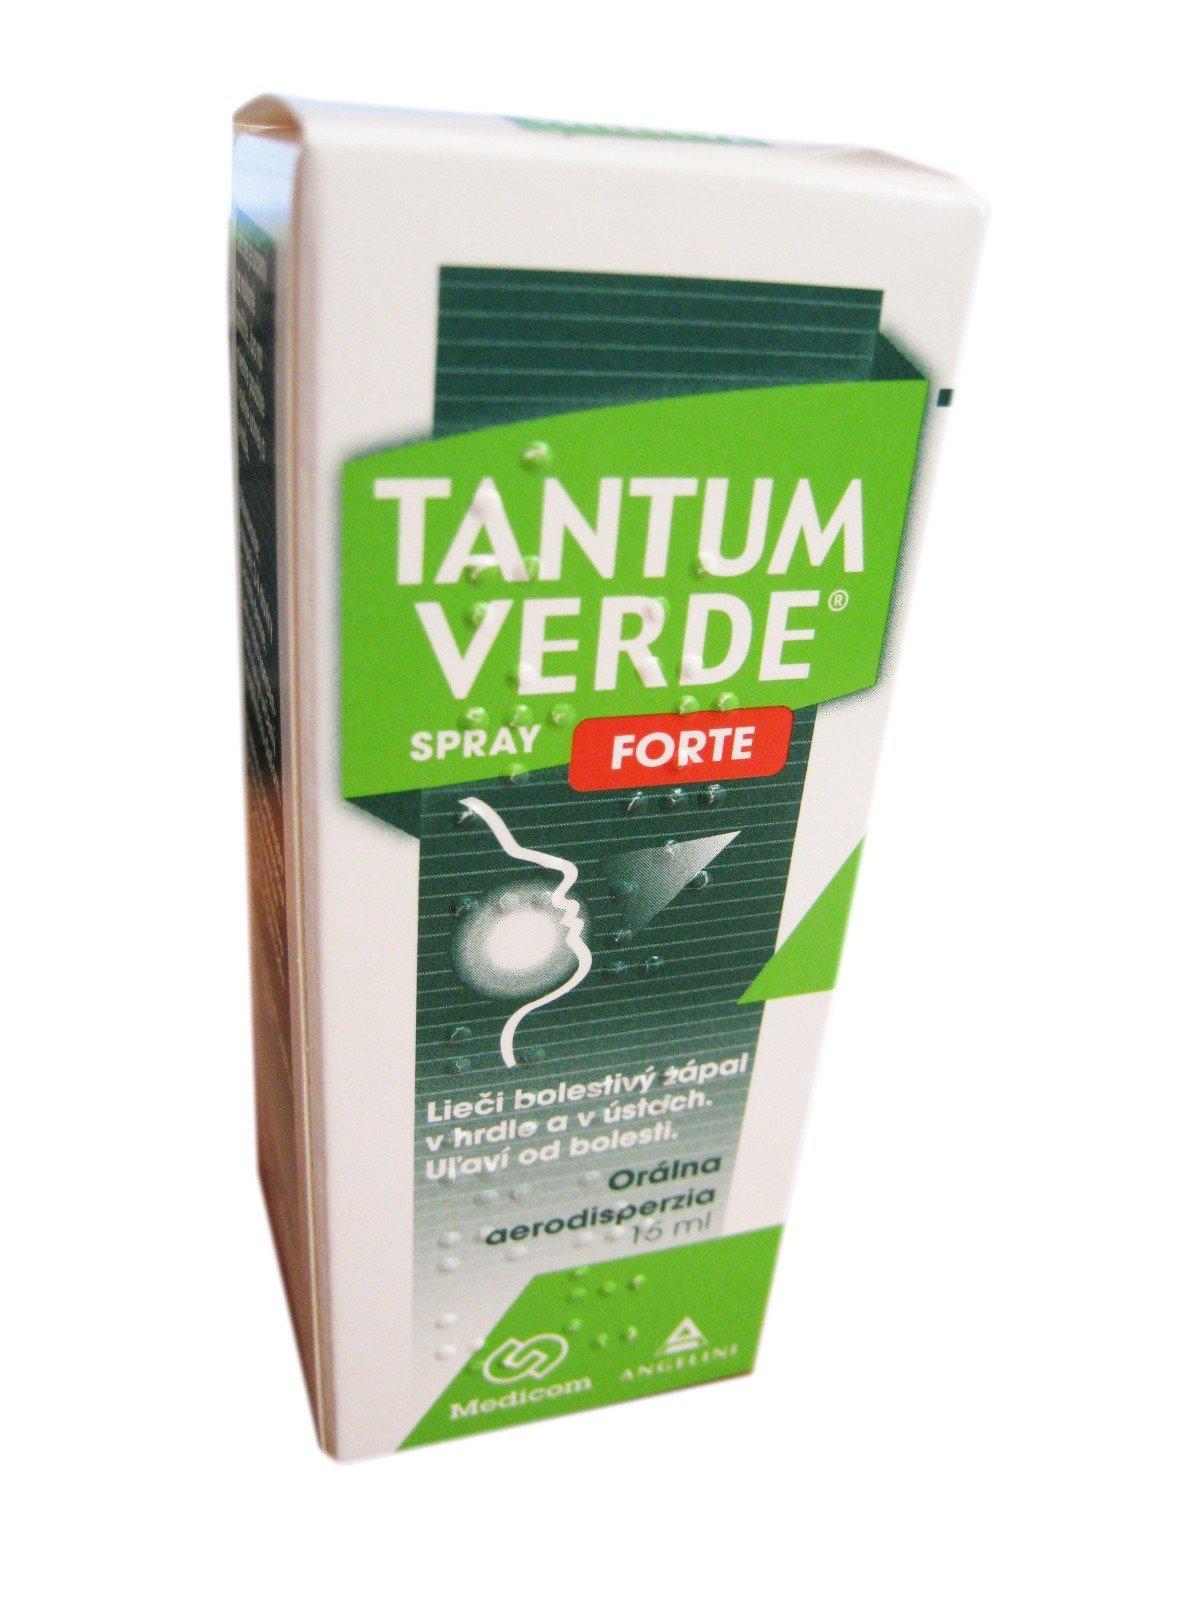 Tantum Verde spray forte 15 ml